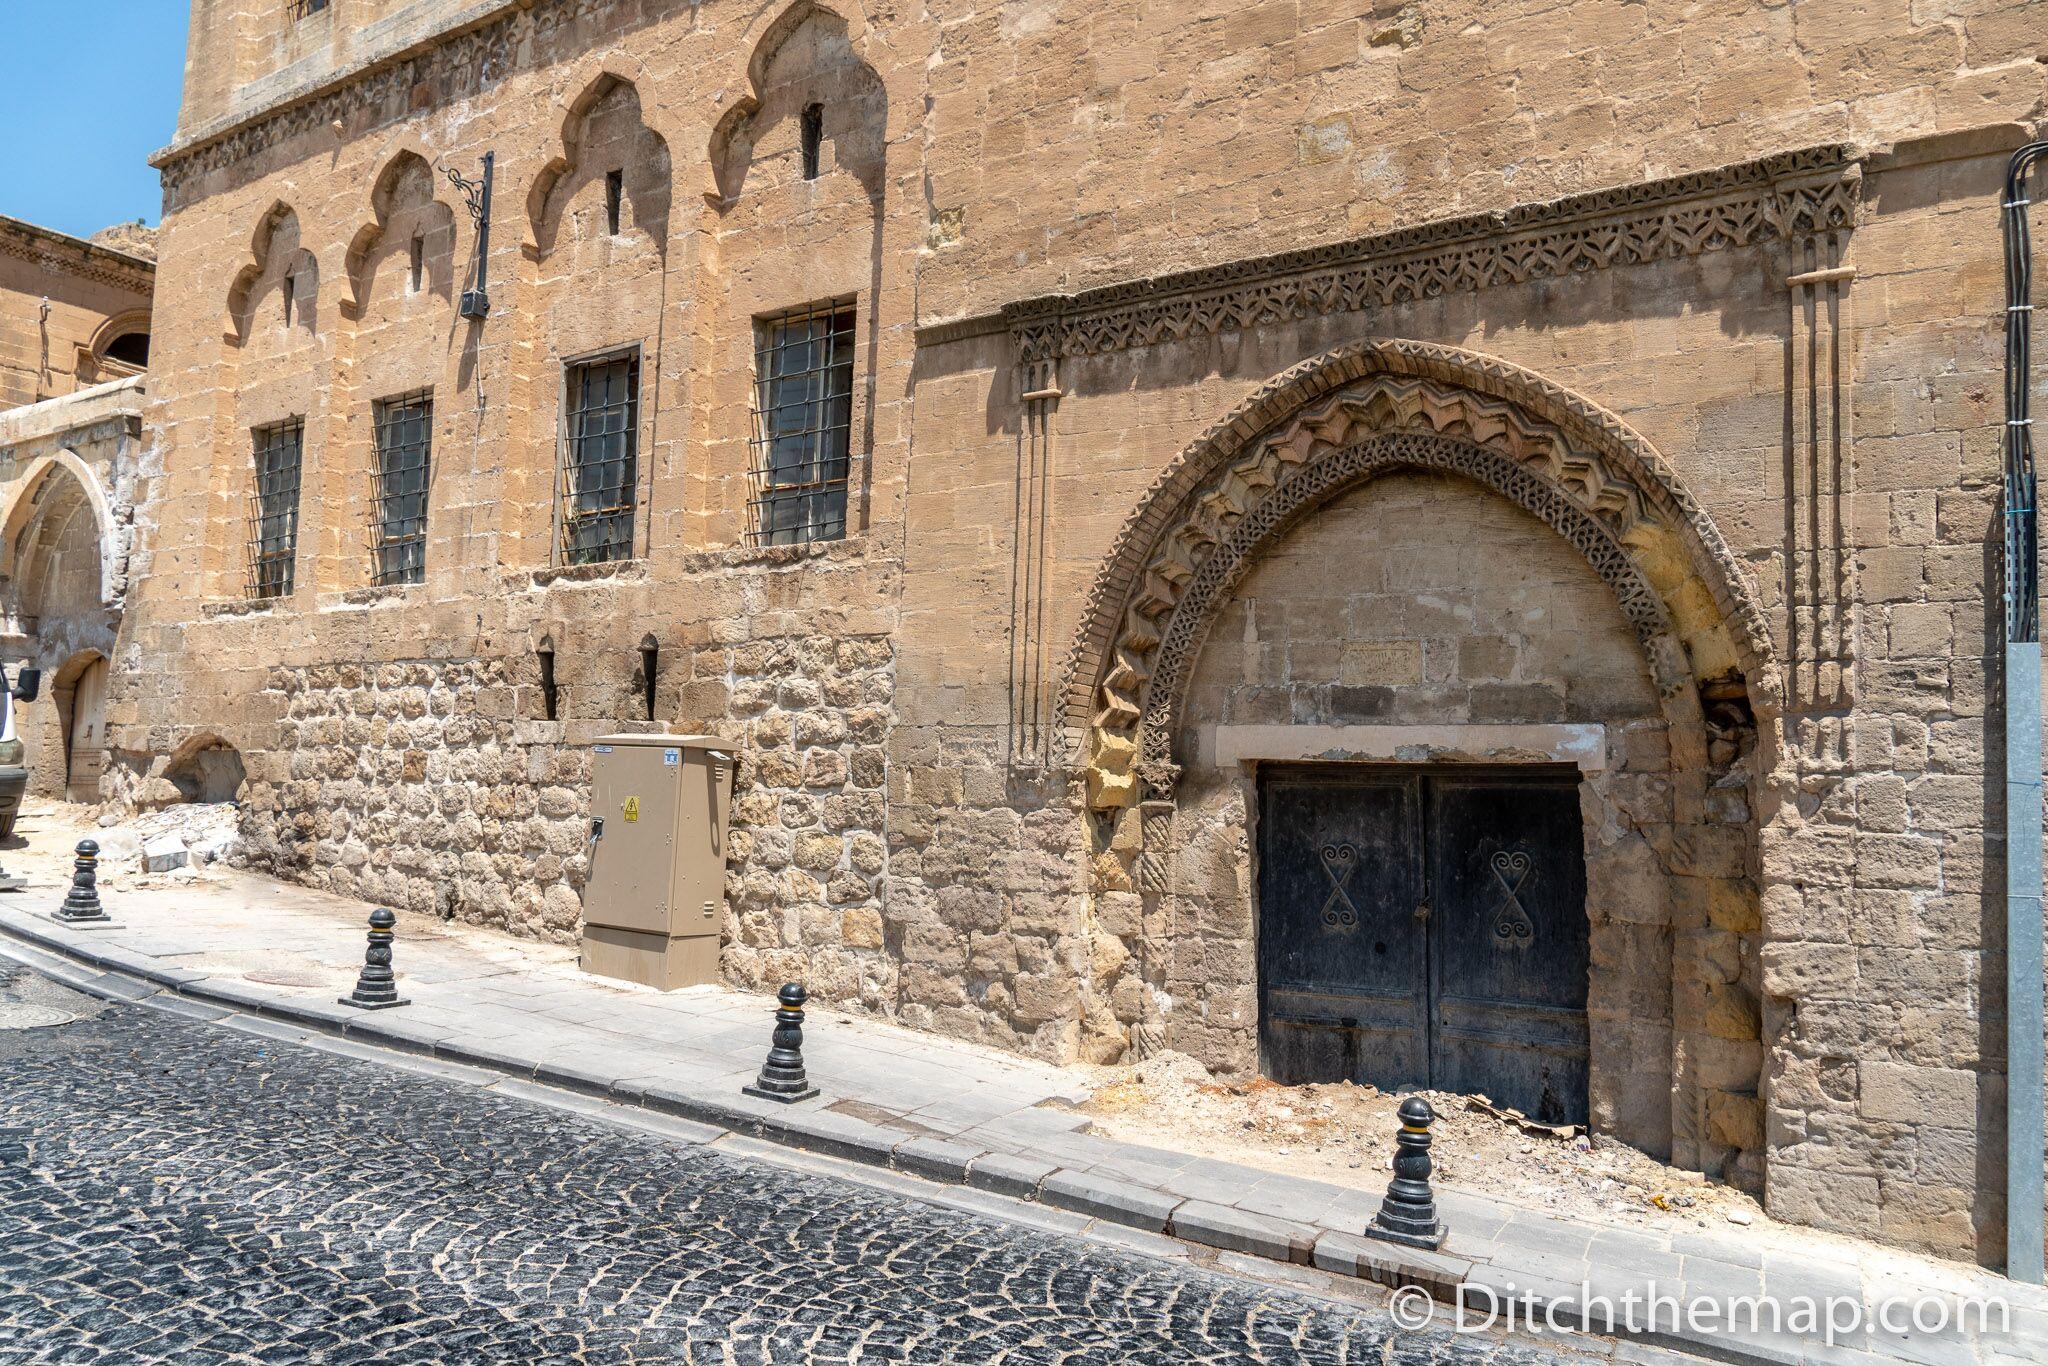 Old doorway in Mardin, Turkey almost buried by the street.